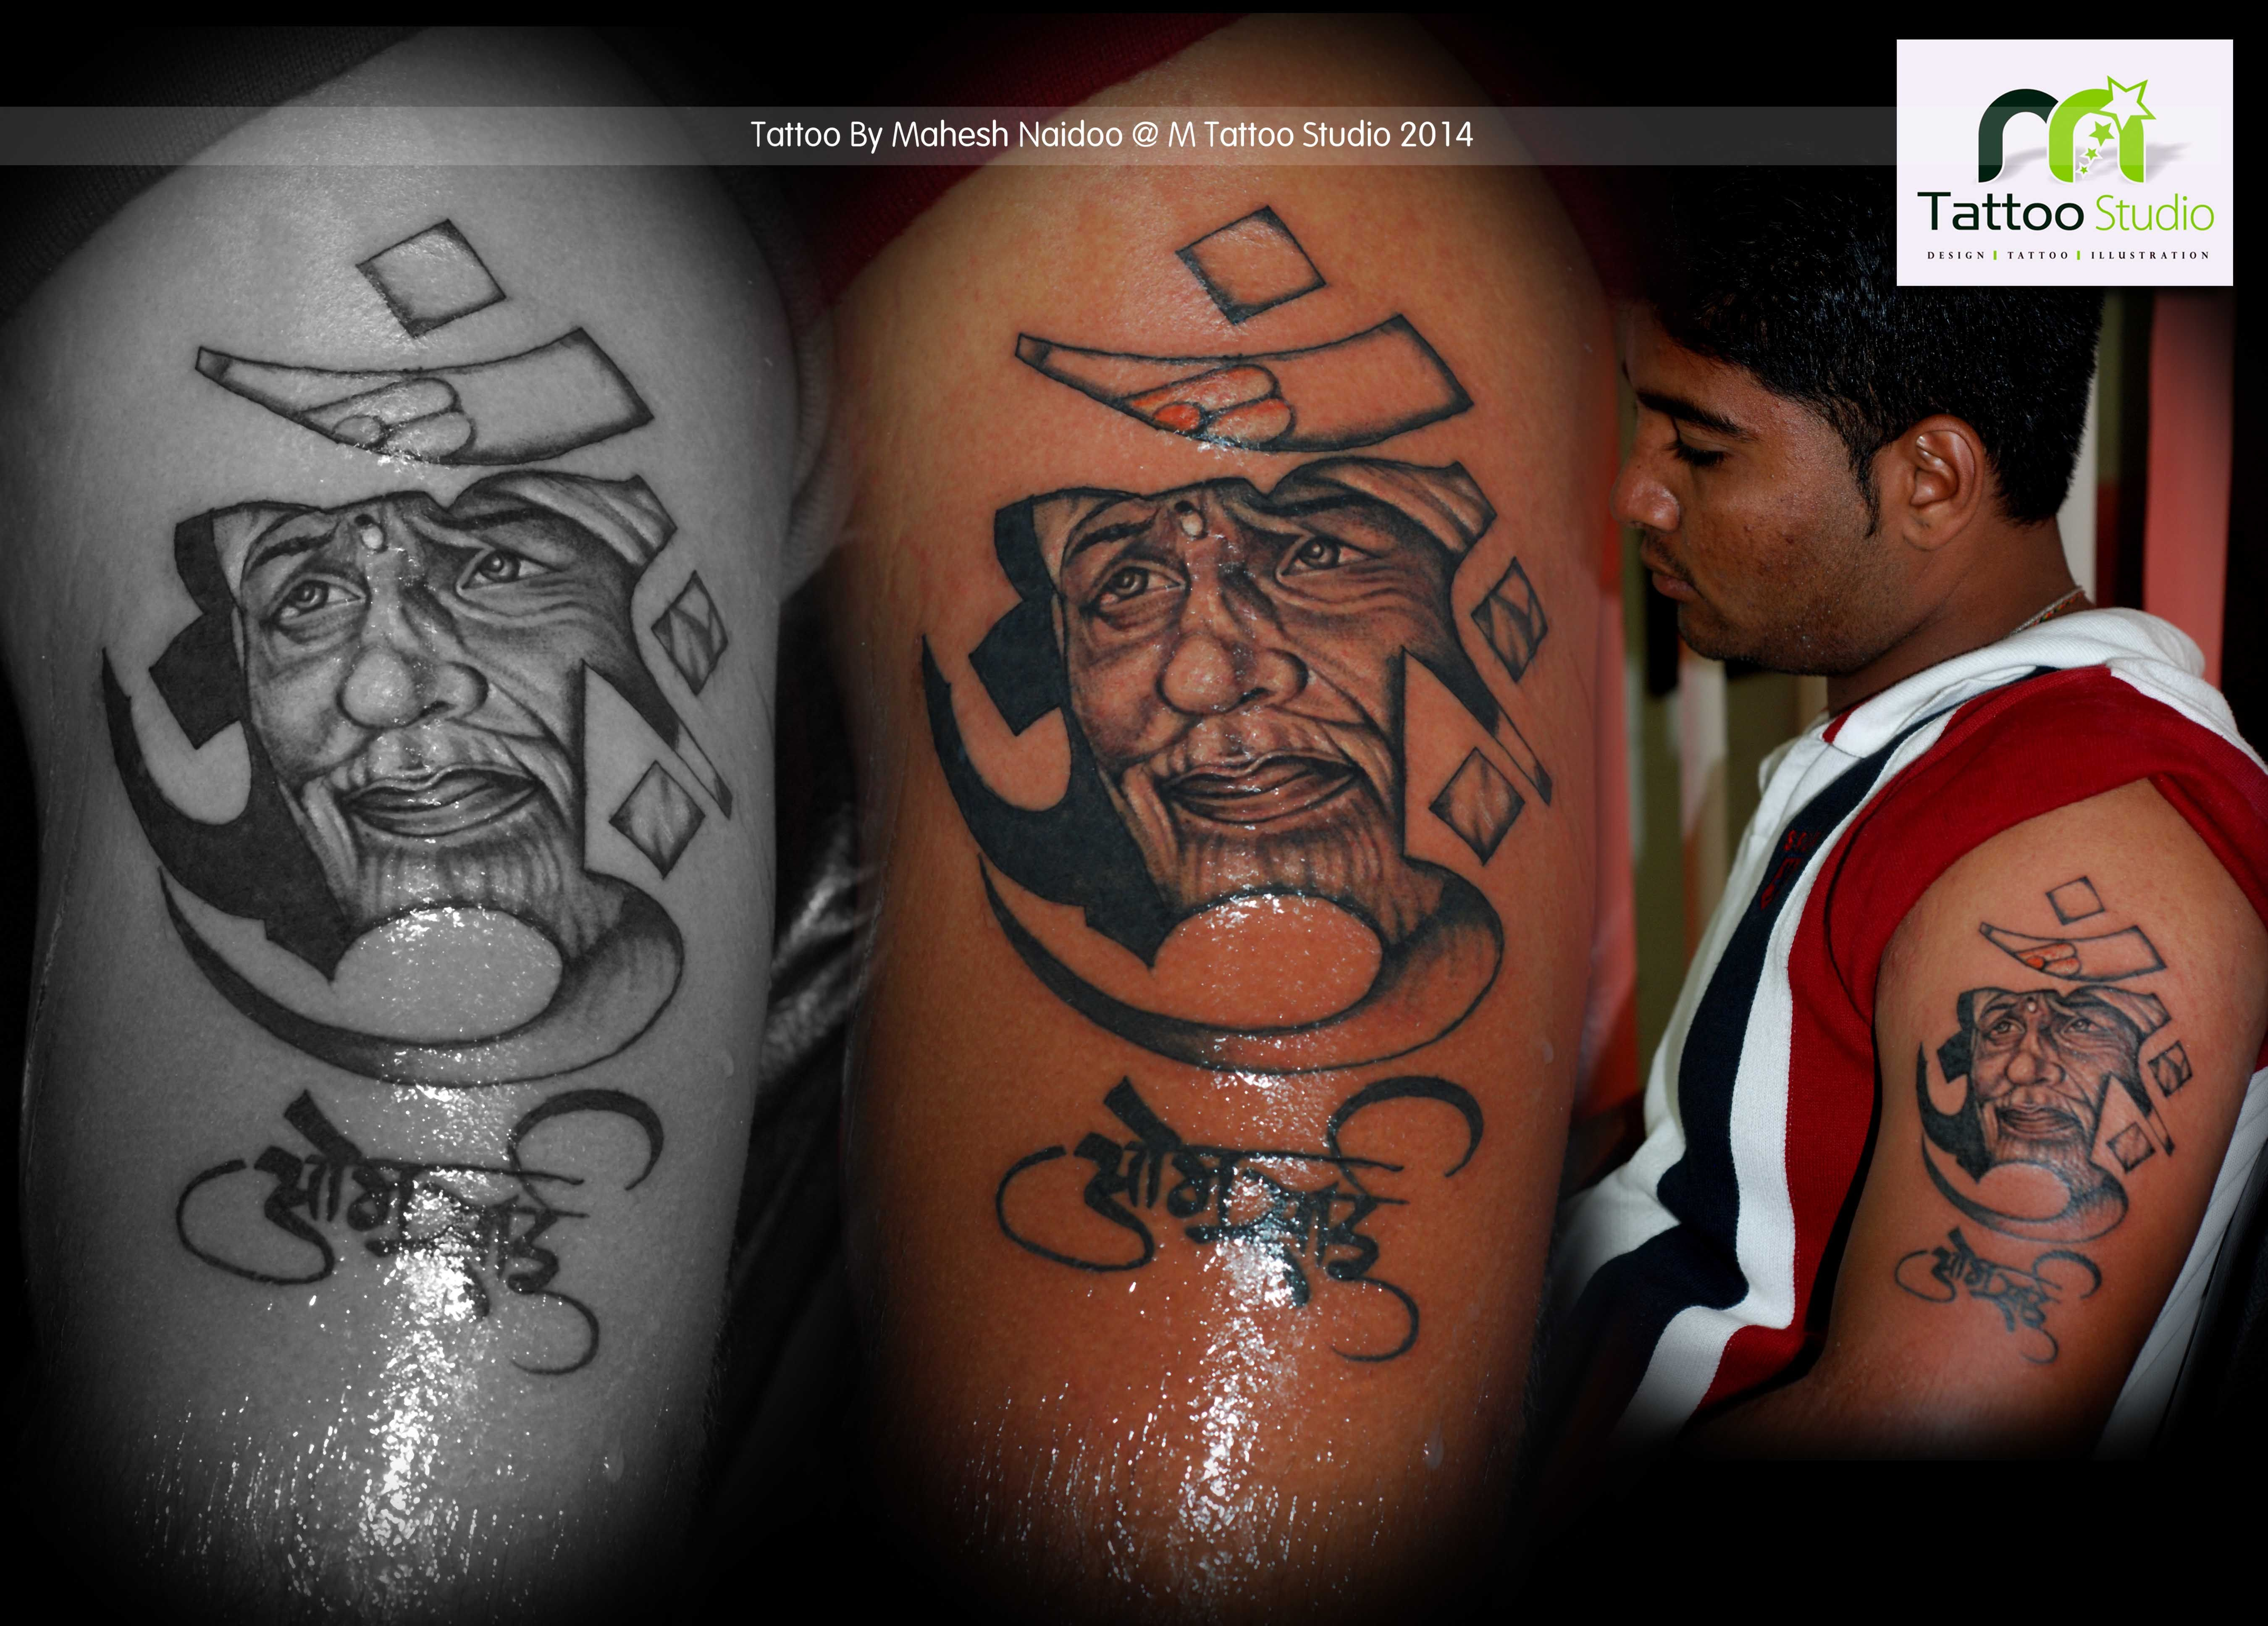 Sai baba tattoo on arms Tattoos, M tattoos, Tattoo studio